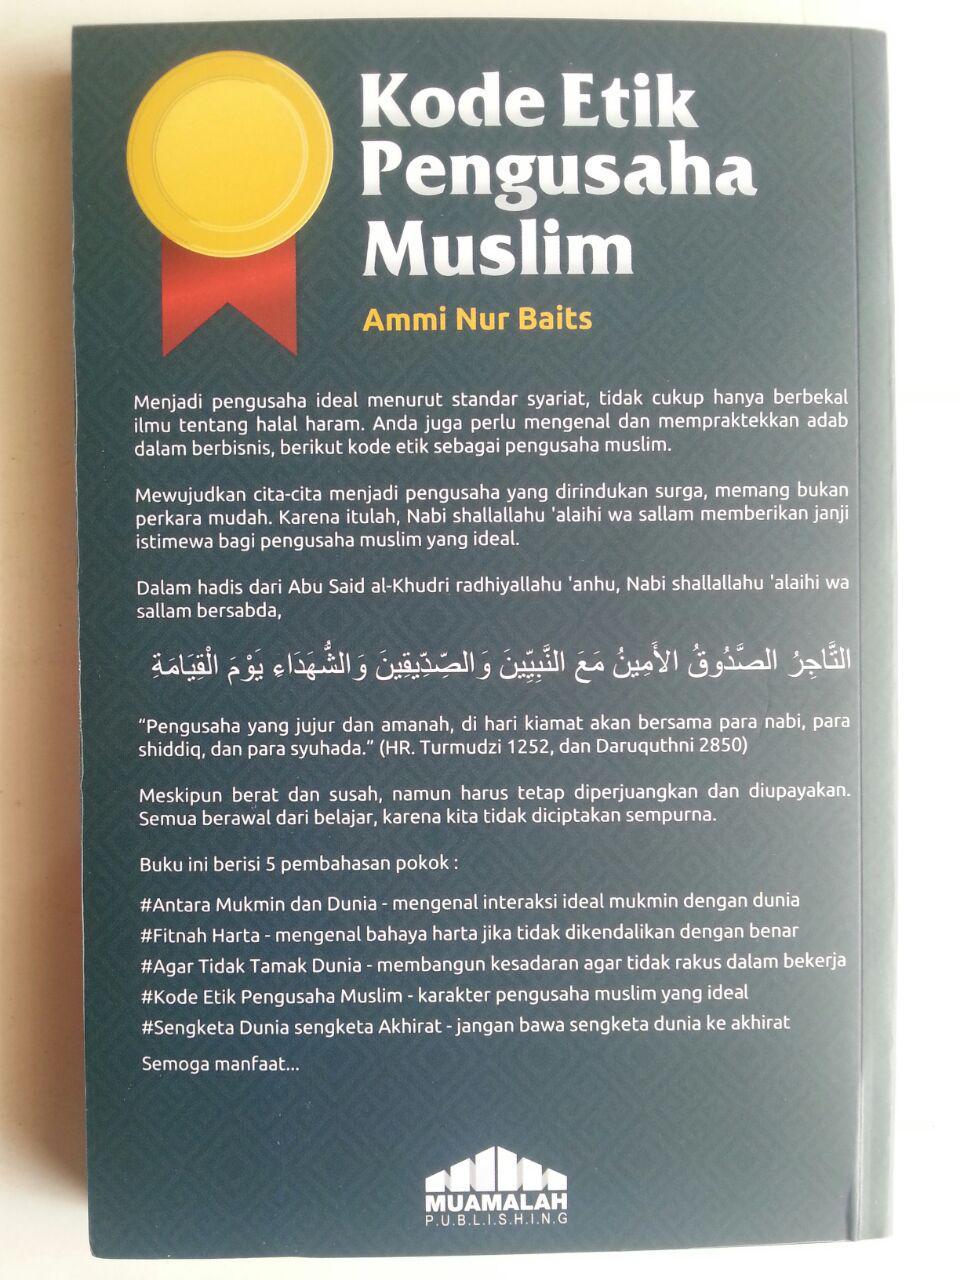 Buku Kode Etik Pengusaha Muslim Menjadi Pengusaha Ideal Standar Syariat cover